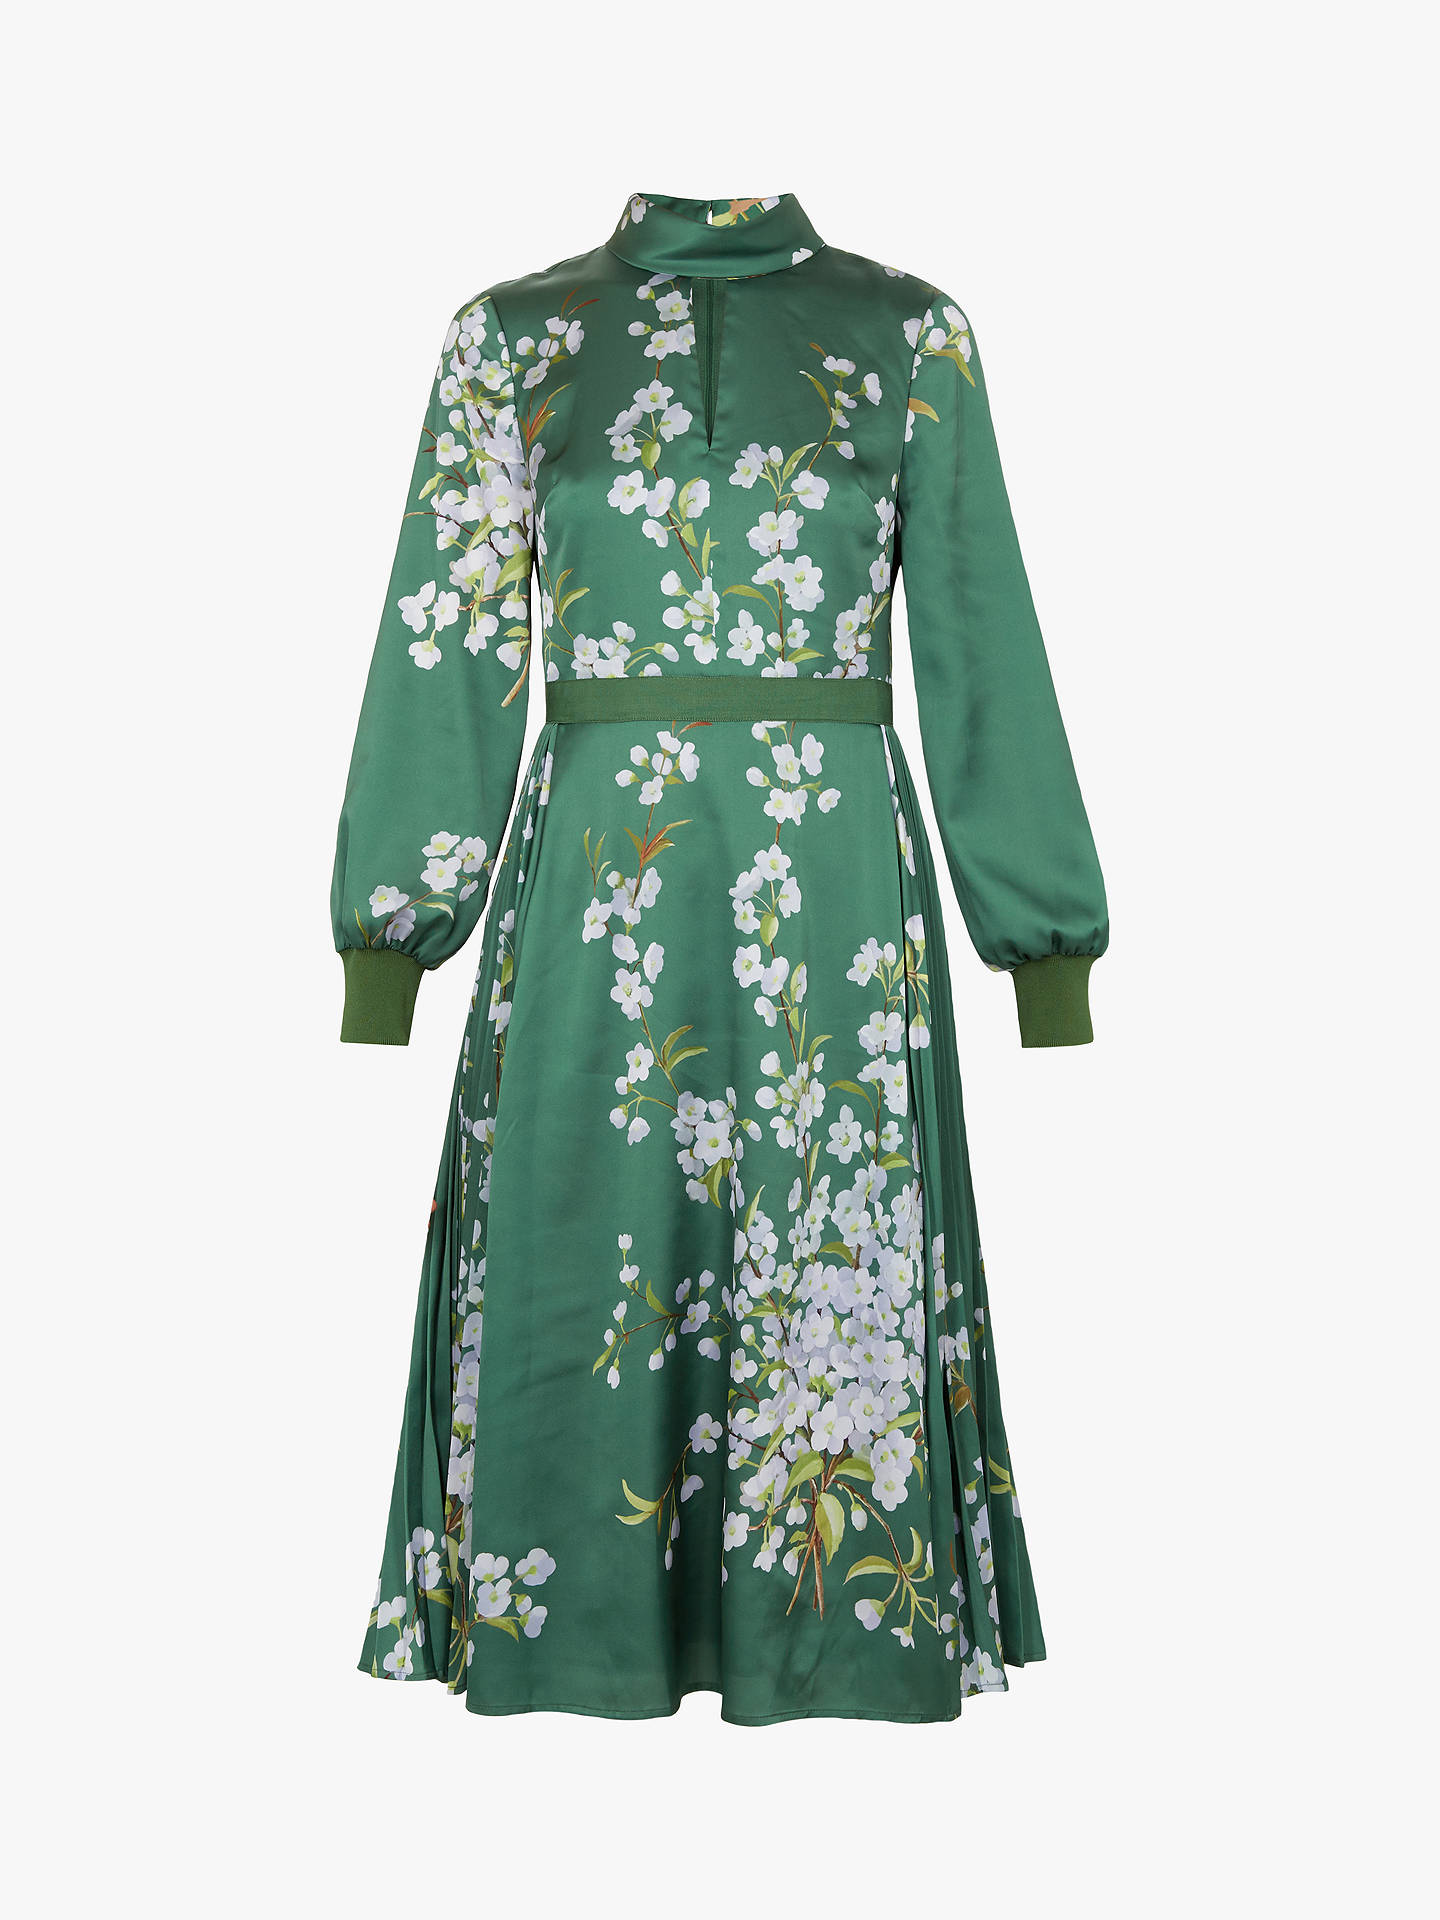 9a4d57b2d ... Buy Ted Baker Jhenni Floral Midi Dress